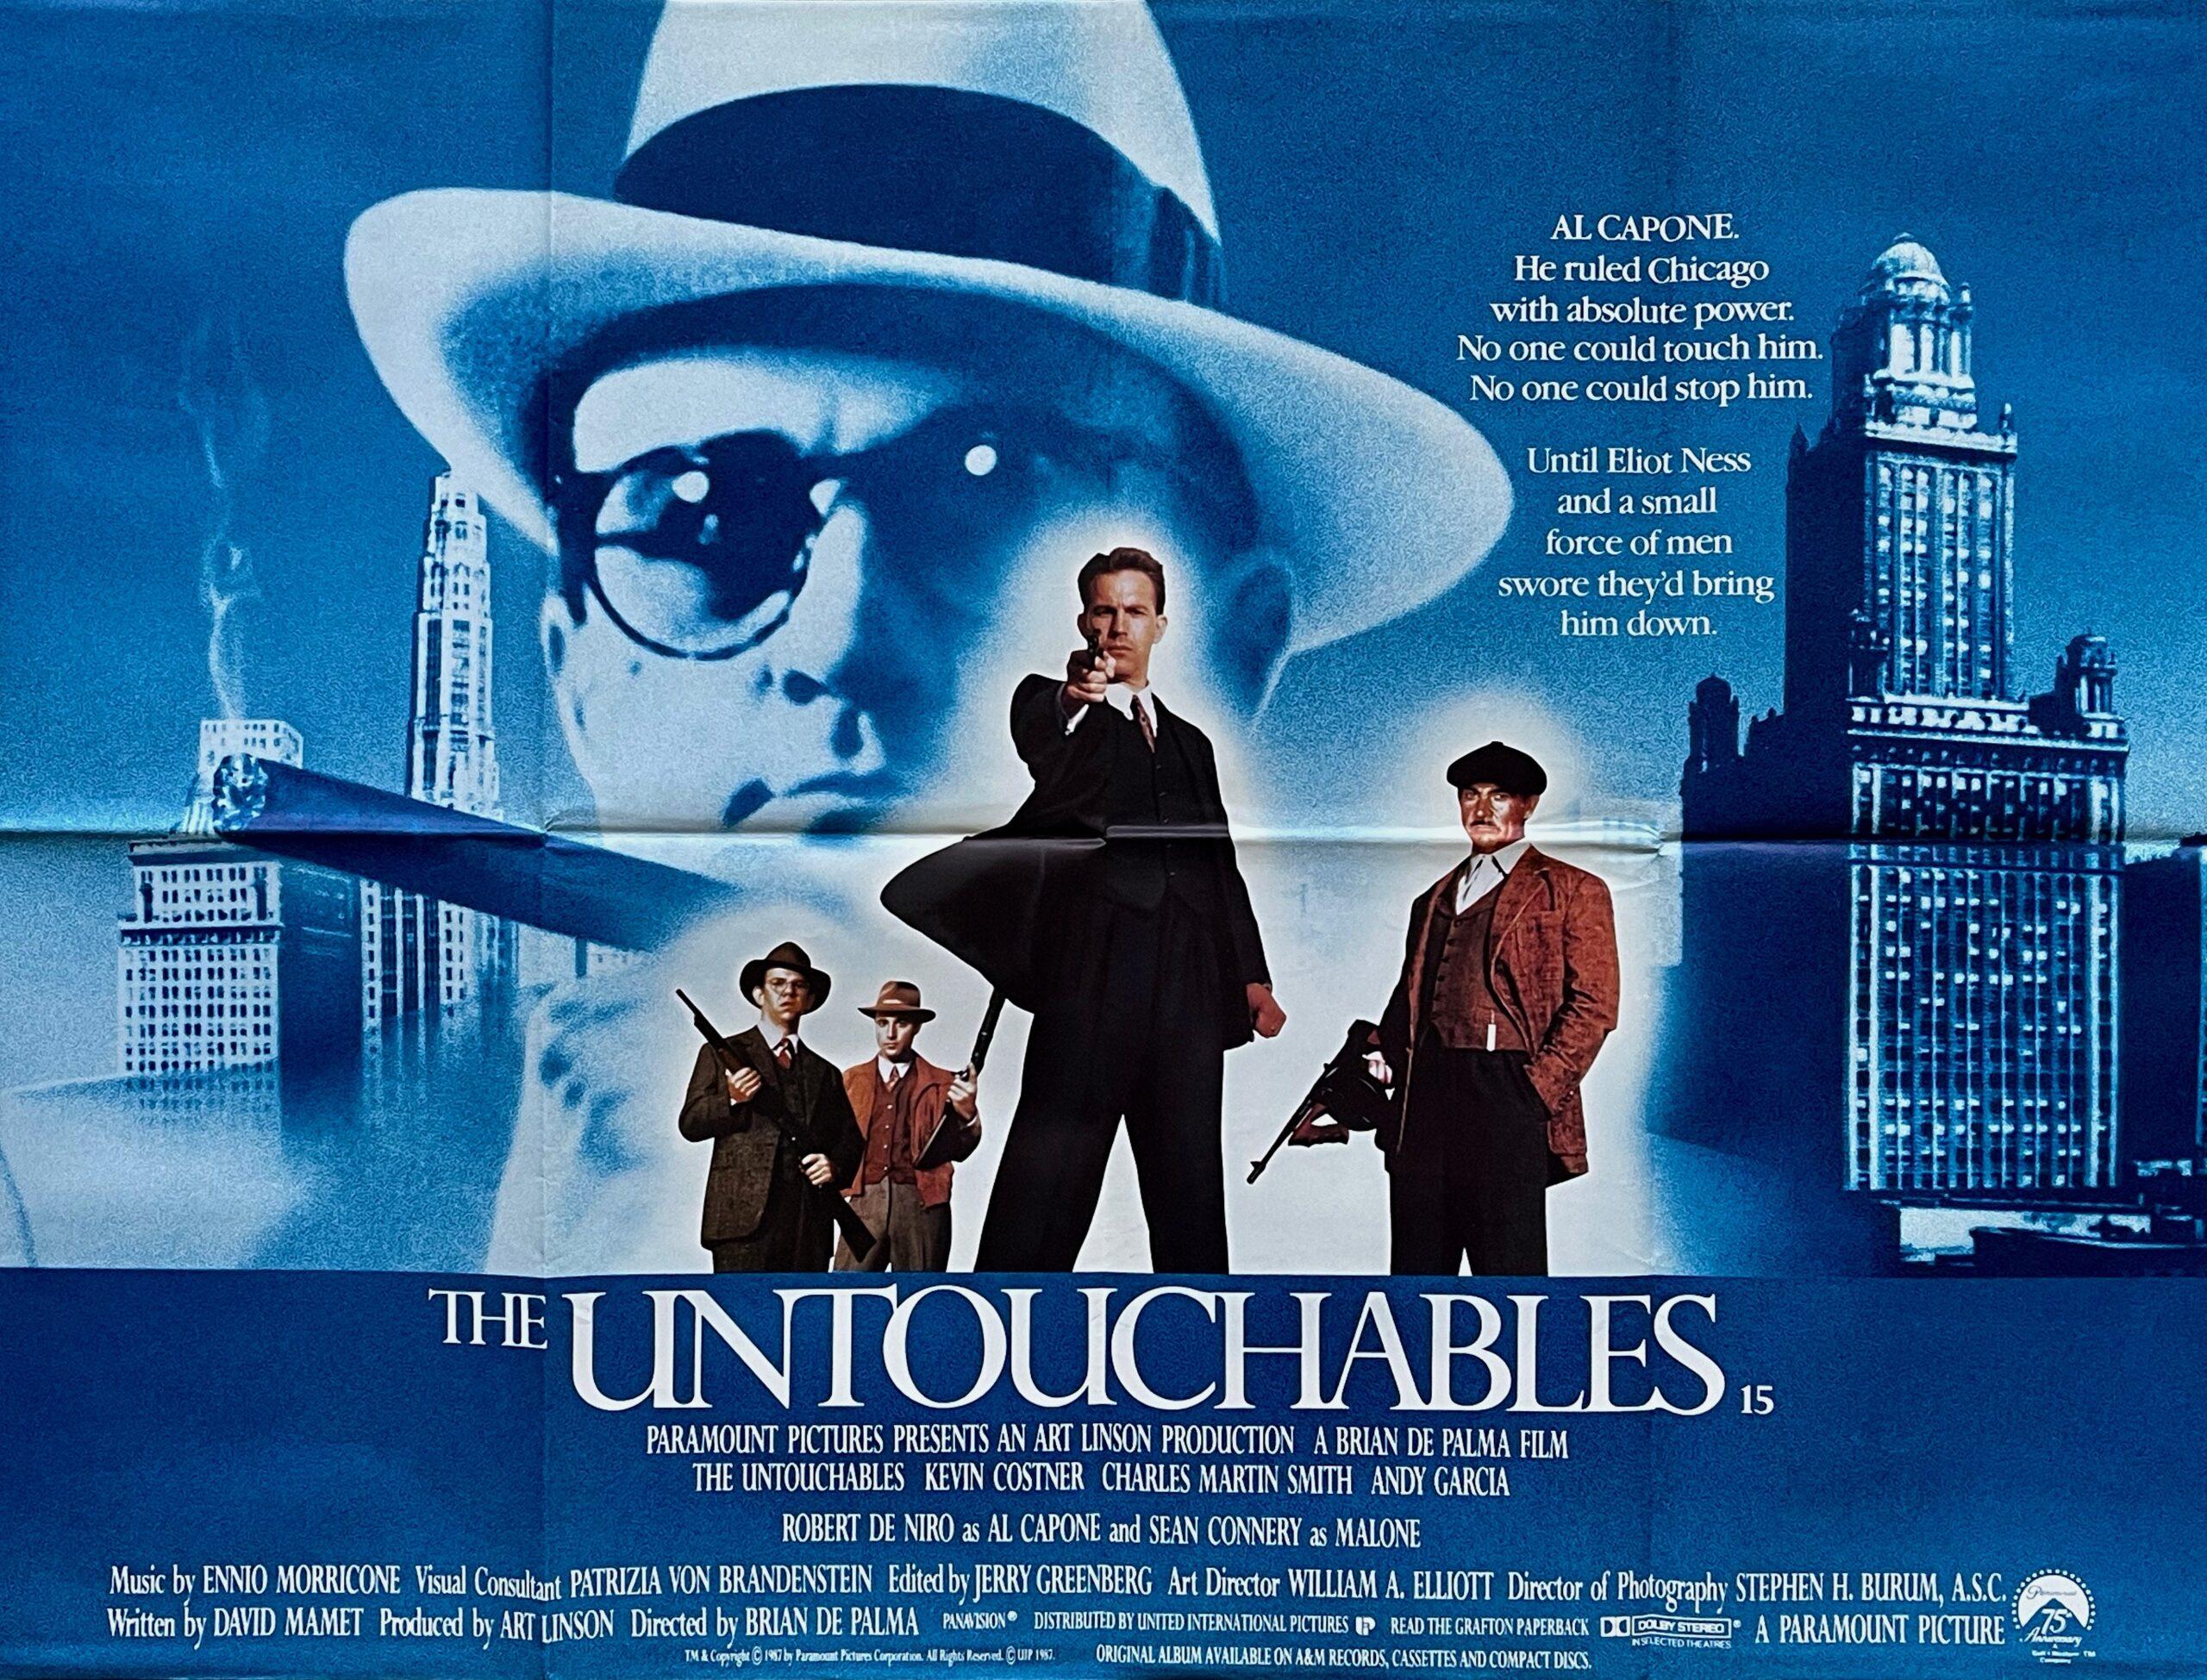 Original The Untouchables Movie Poster - Al Capone - Crime - Gangsters